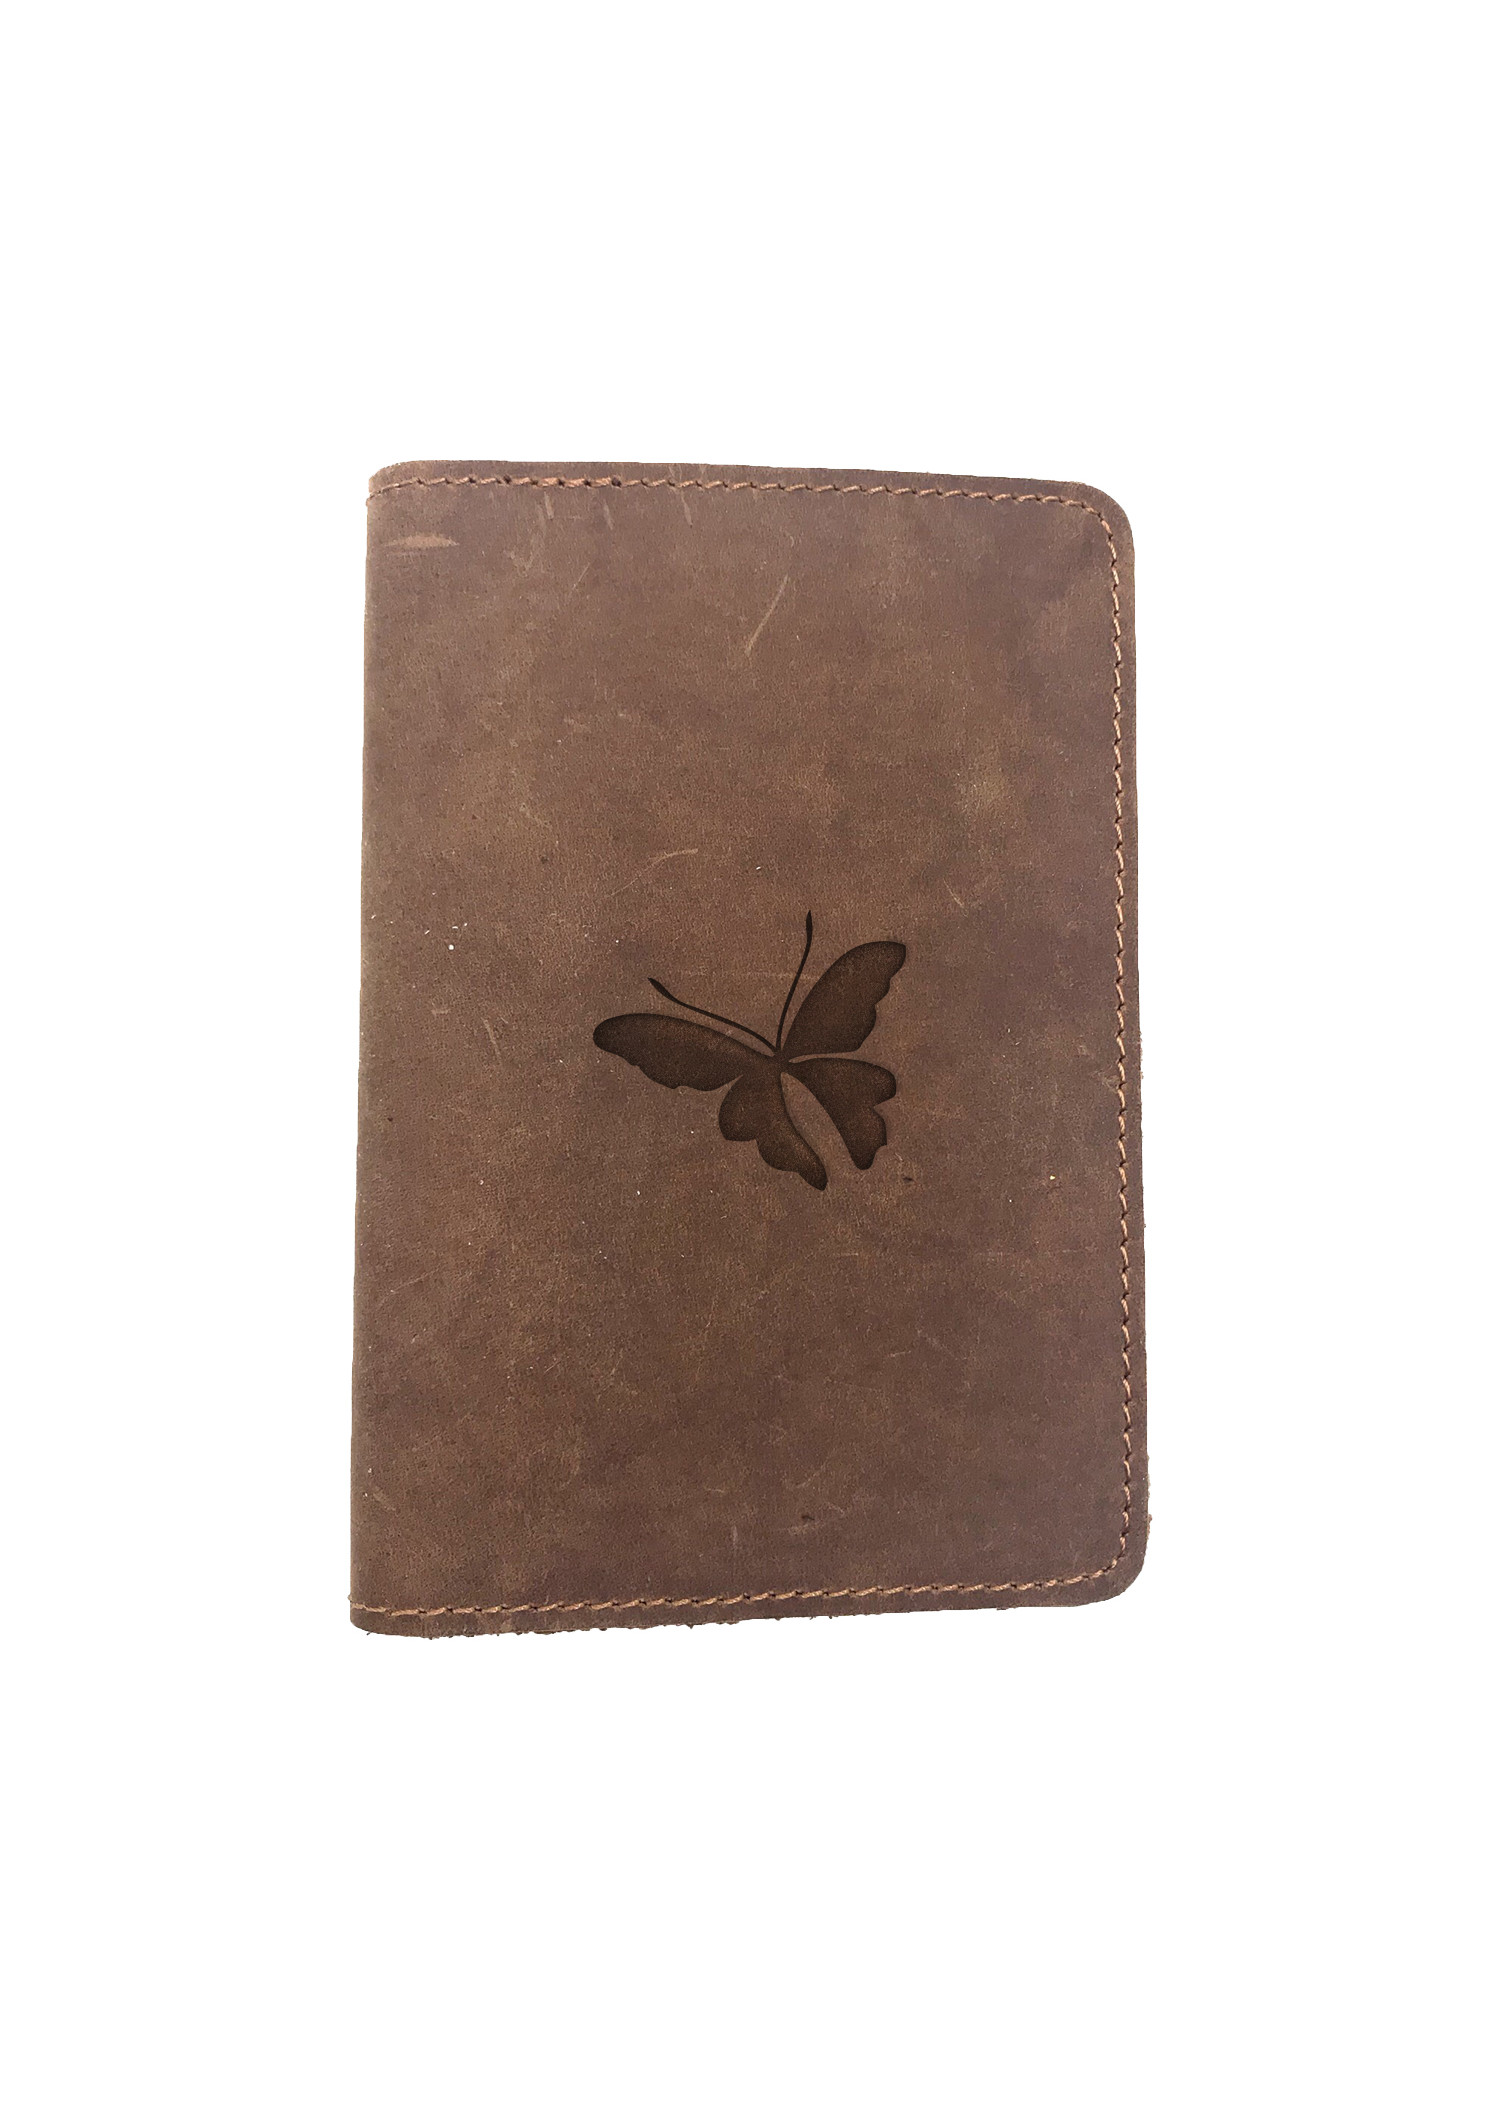 Passport Cover Bao Da Hộ Chiếu Da Sáp Khắc Hình Bướm BUTTERFLY STENCIL ART (BROWN)